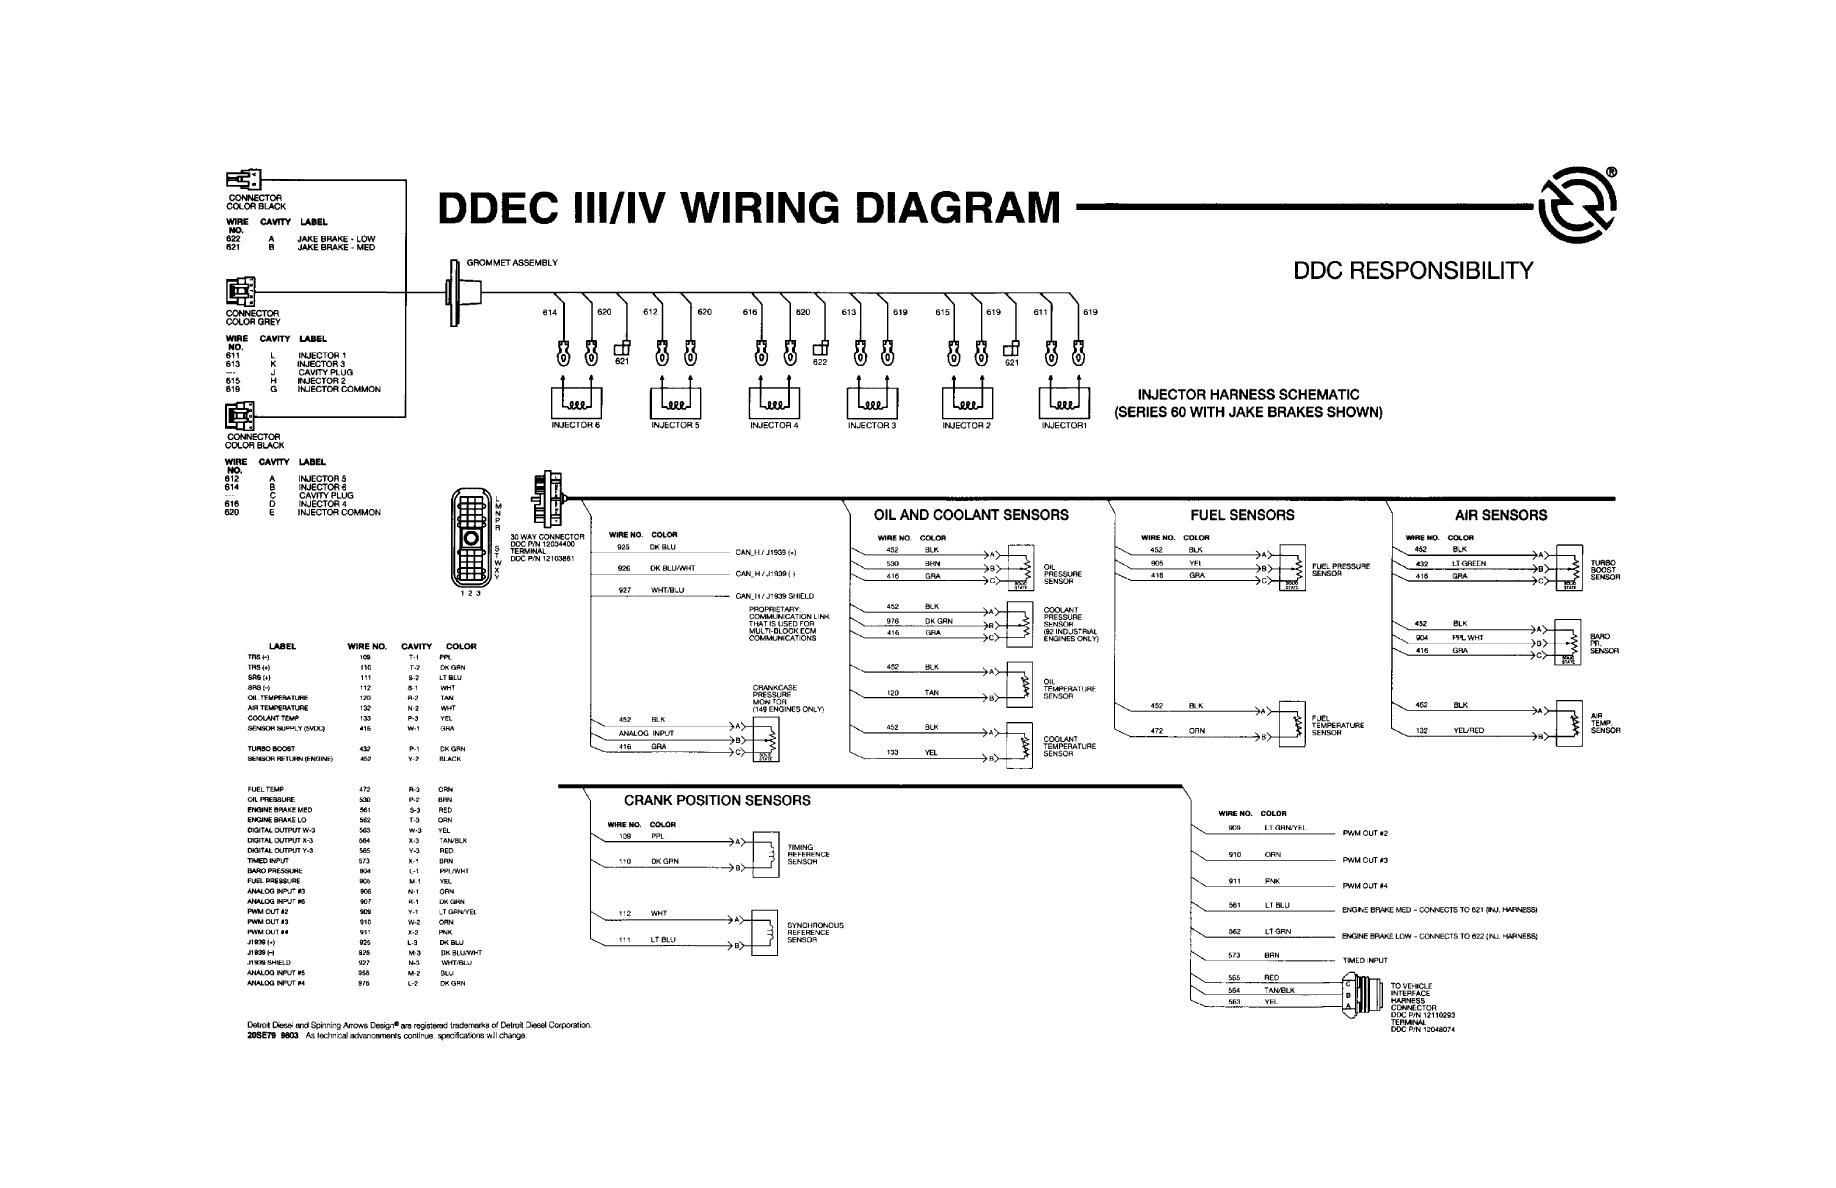 Ddec 111 Wiring Diagram - Wiring Diagrams Word Ddec Ecm Pinout Wiring Diagram on